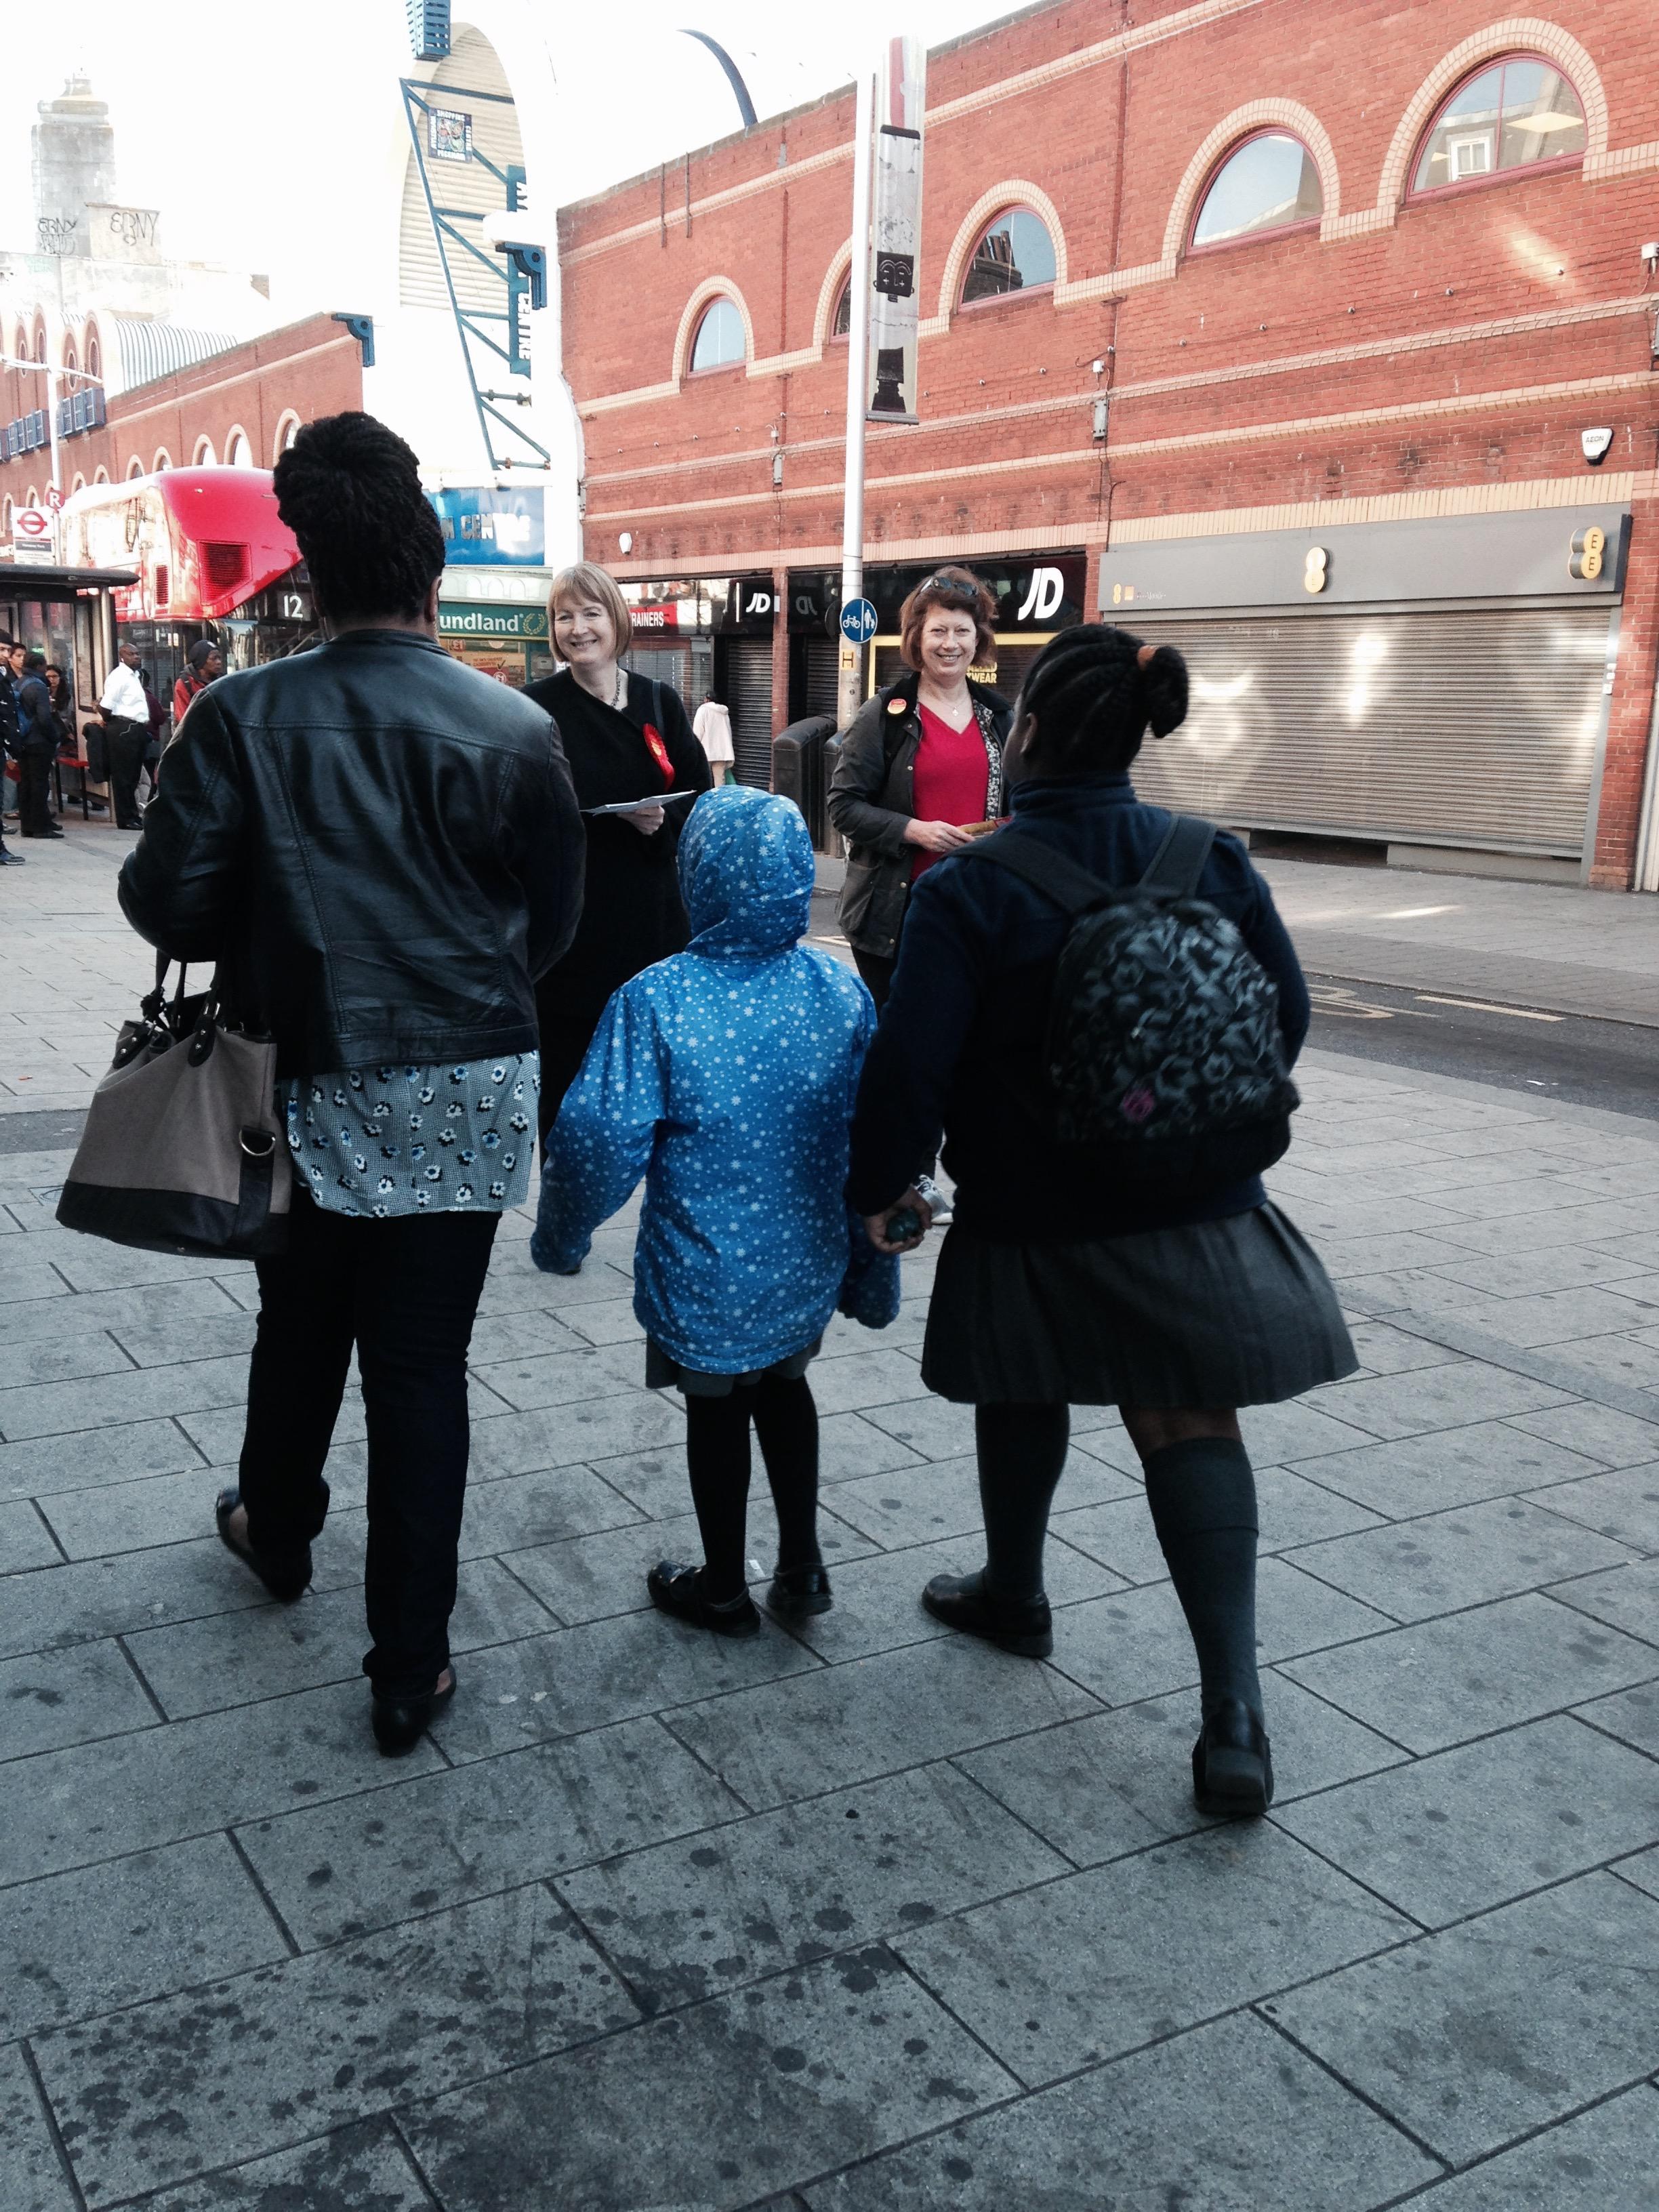 Peckham_bus_stop3_21.4.15.jpg